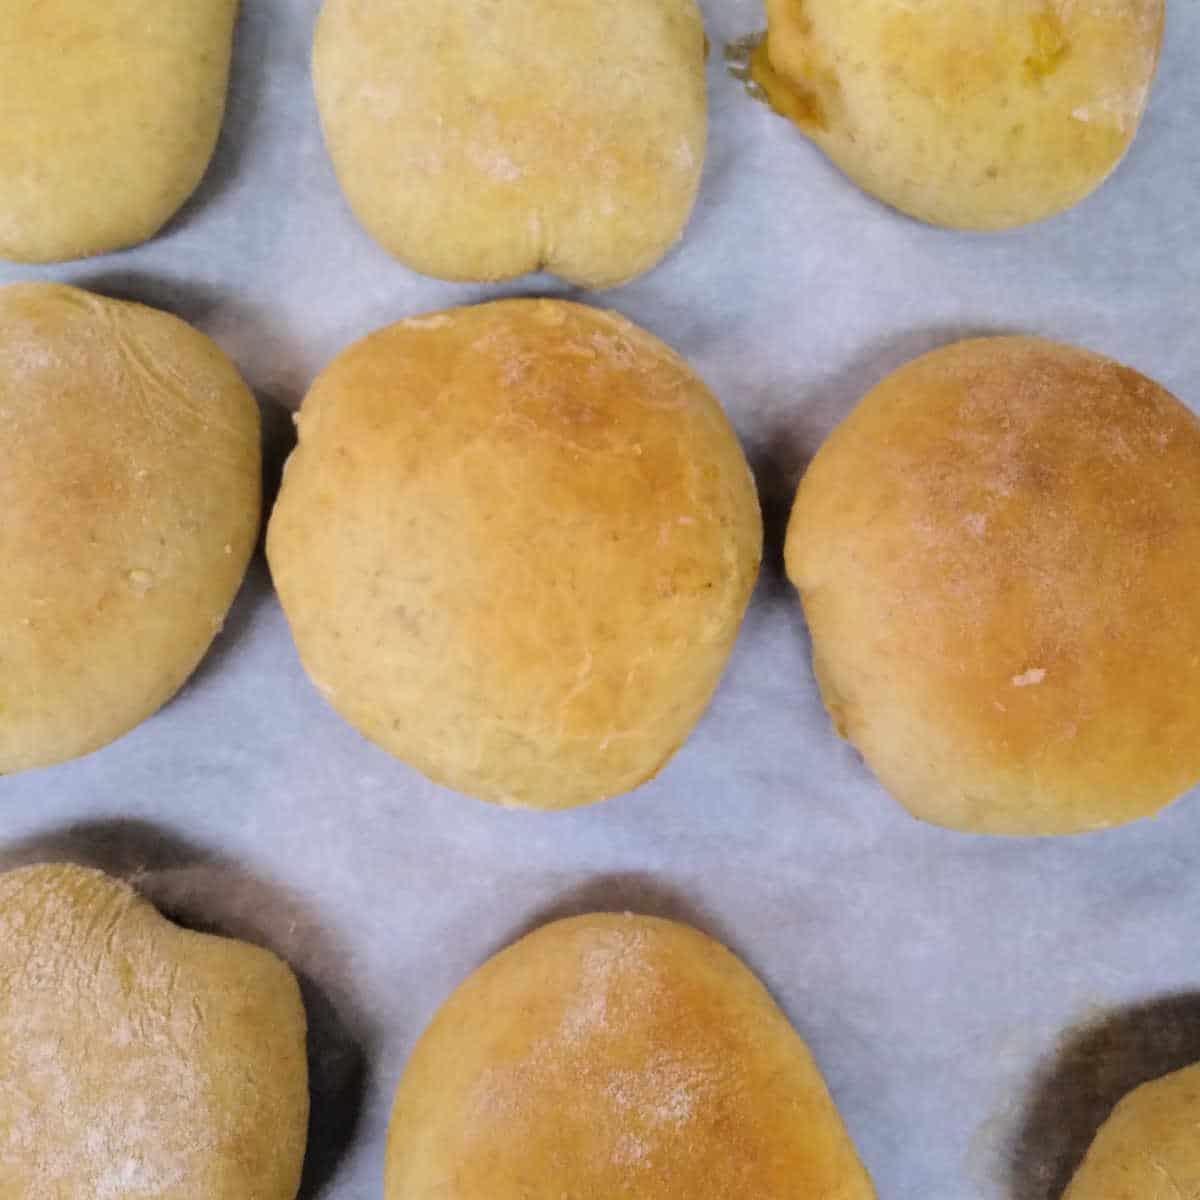 bierock sandwiches on the baking tray